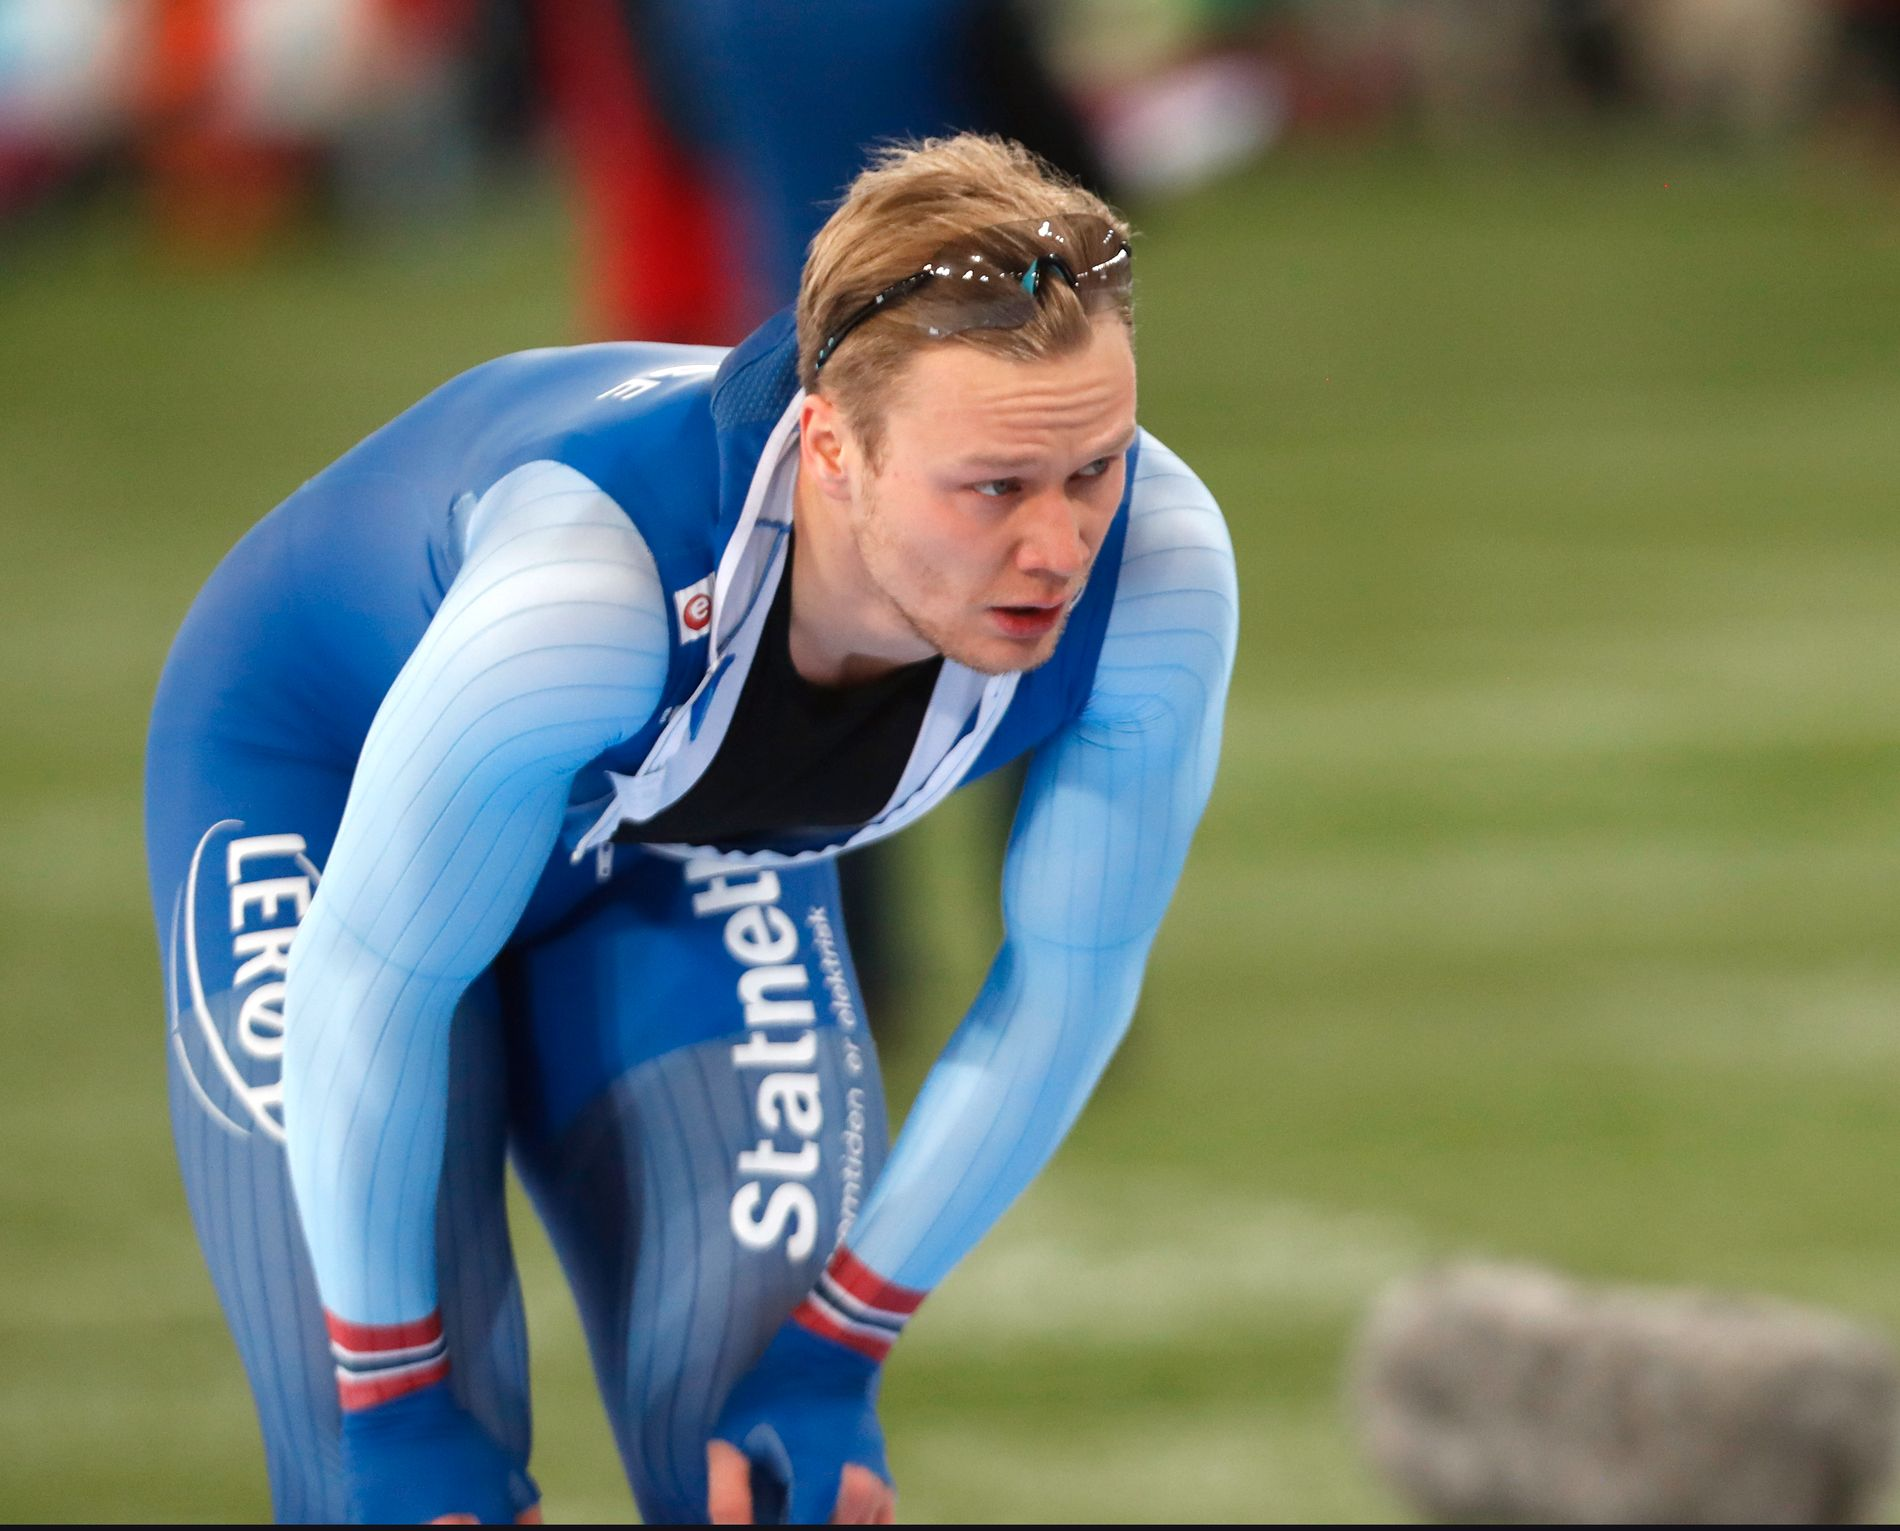 Håvard Holmefjord Lorentzen mener han var dårligere teknisk på skøyter i 2018/2019-sesongen.